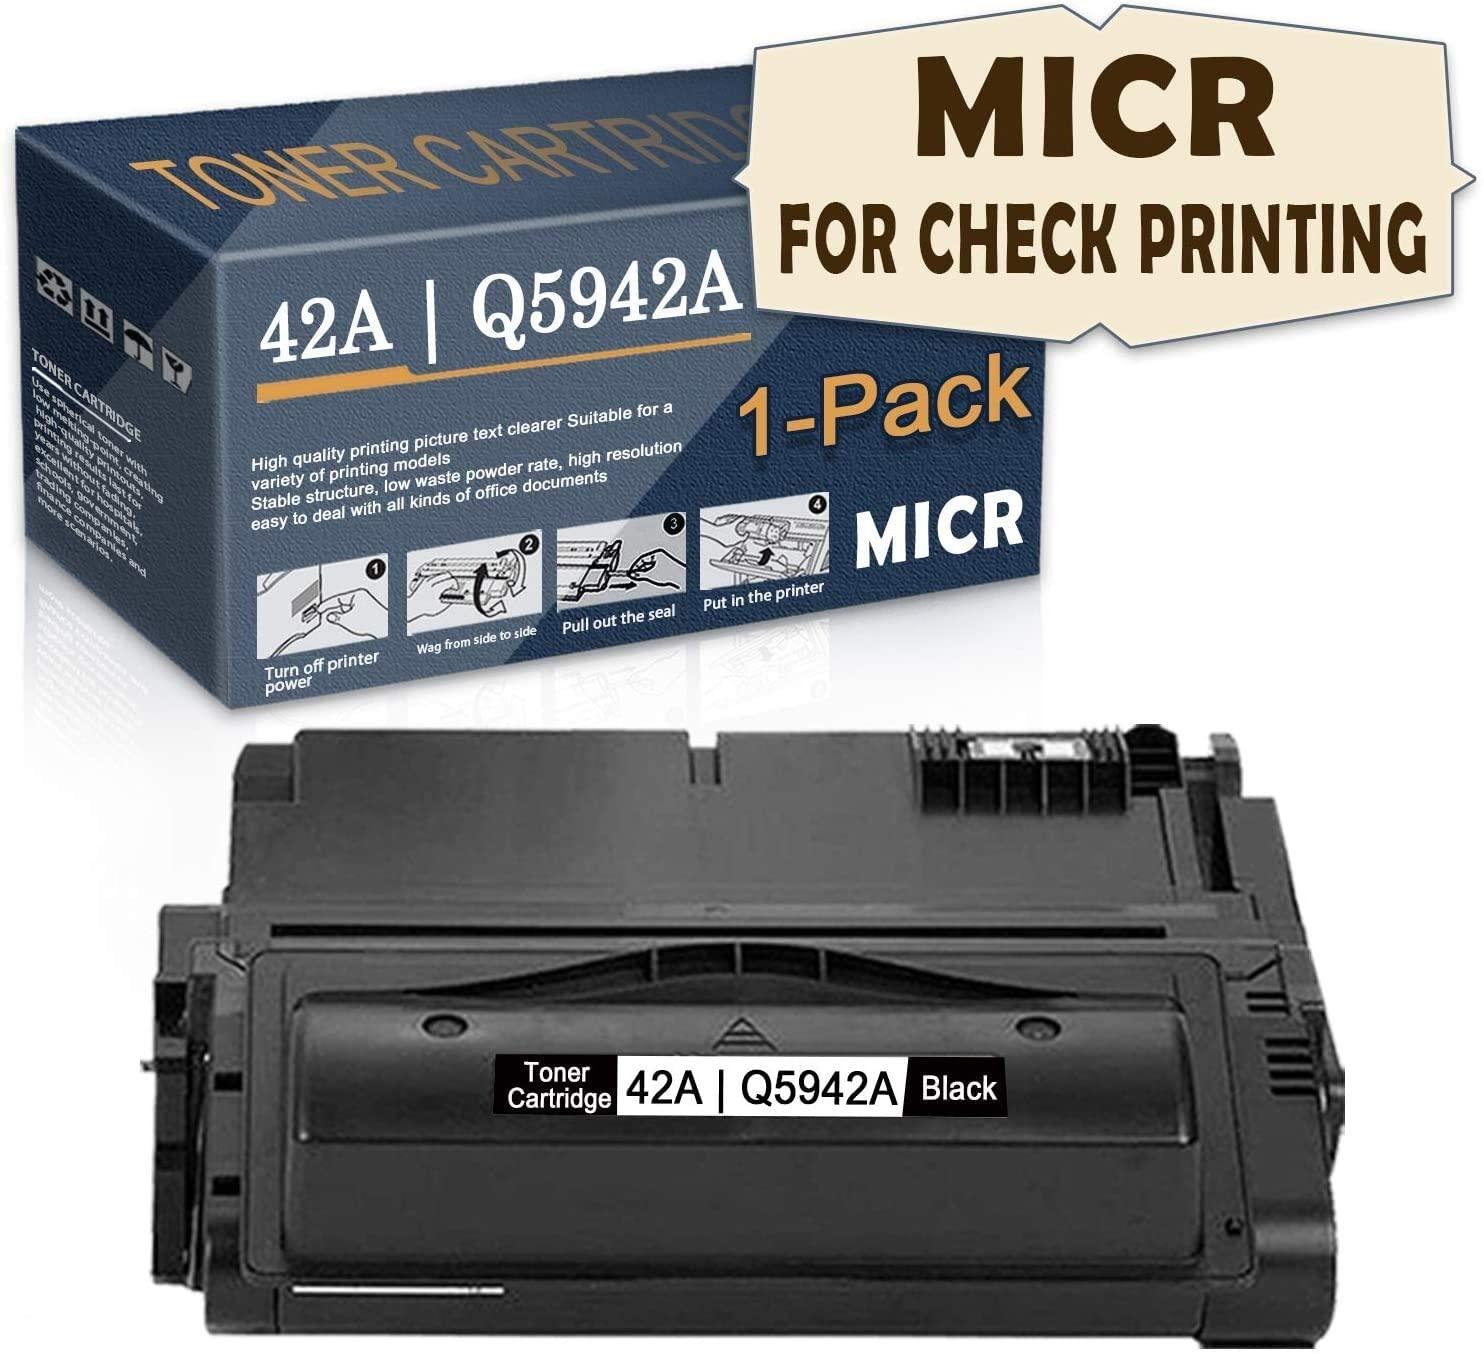 1-Pack ofBlack 42A Compatible 42A   Q5942A MICRToner Cartridge(MICR for Check Printing) Replacementfor HP Laserjet 4200TN 4250tn 4250 4200 4300tn 4200N 4200dtn 4250n 4300n Printer,bySatink.